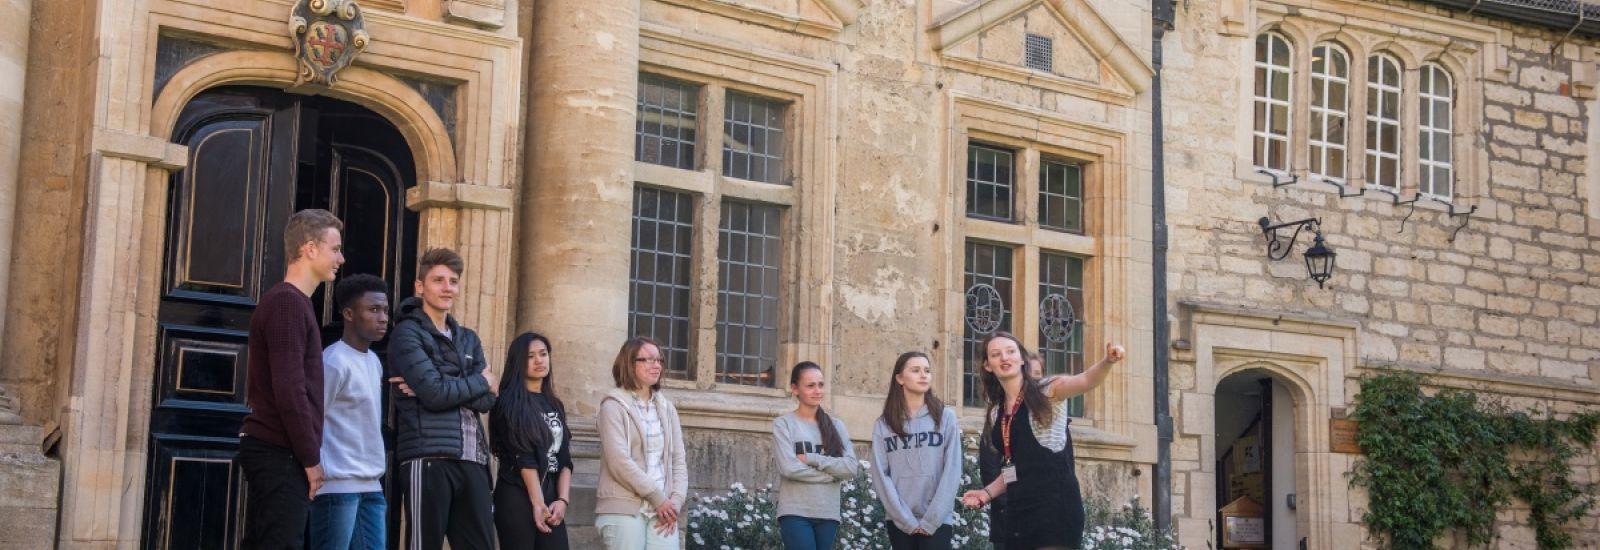 Student Ambassador showing prospective students around St Edmund Hall.